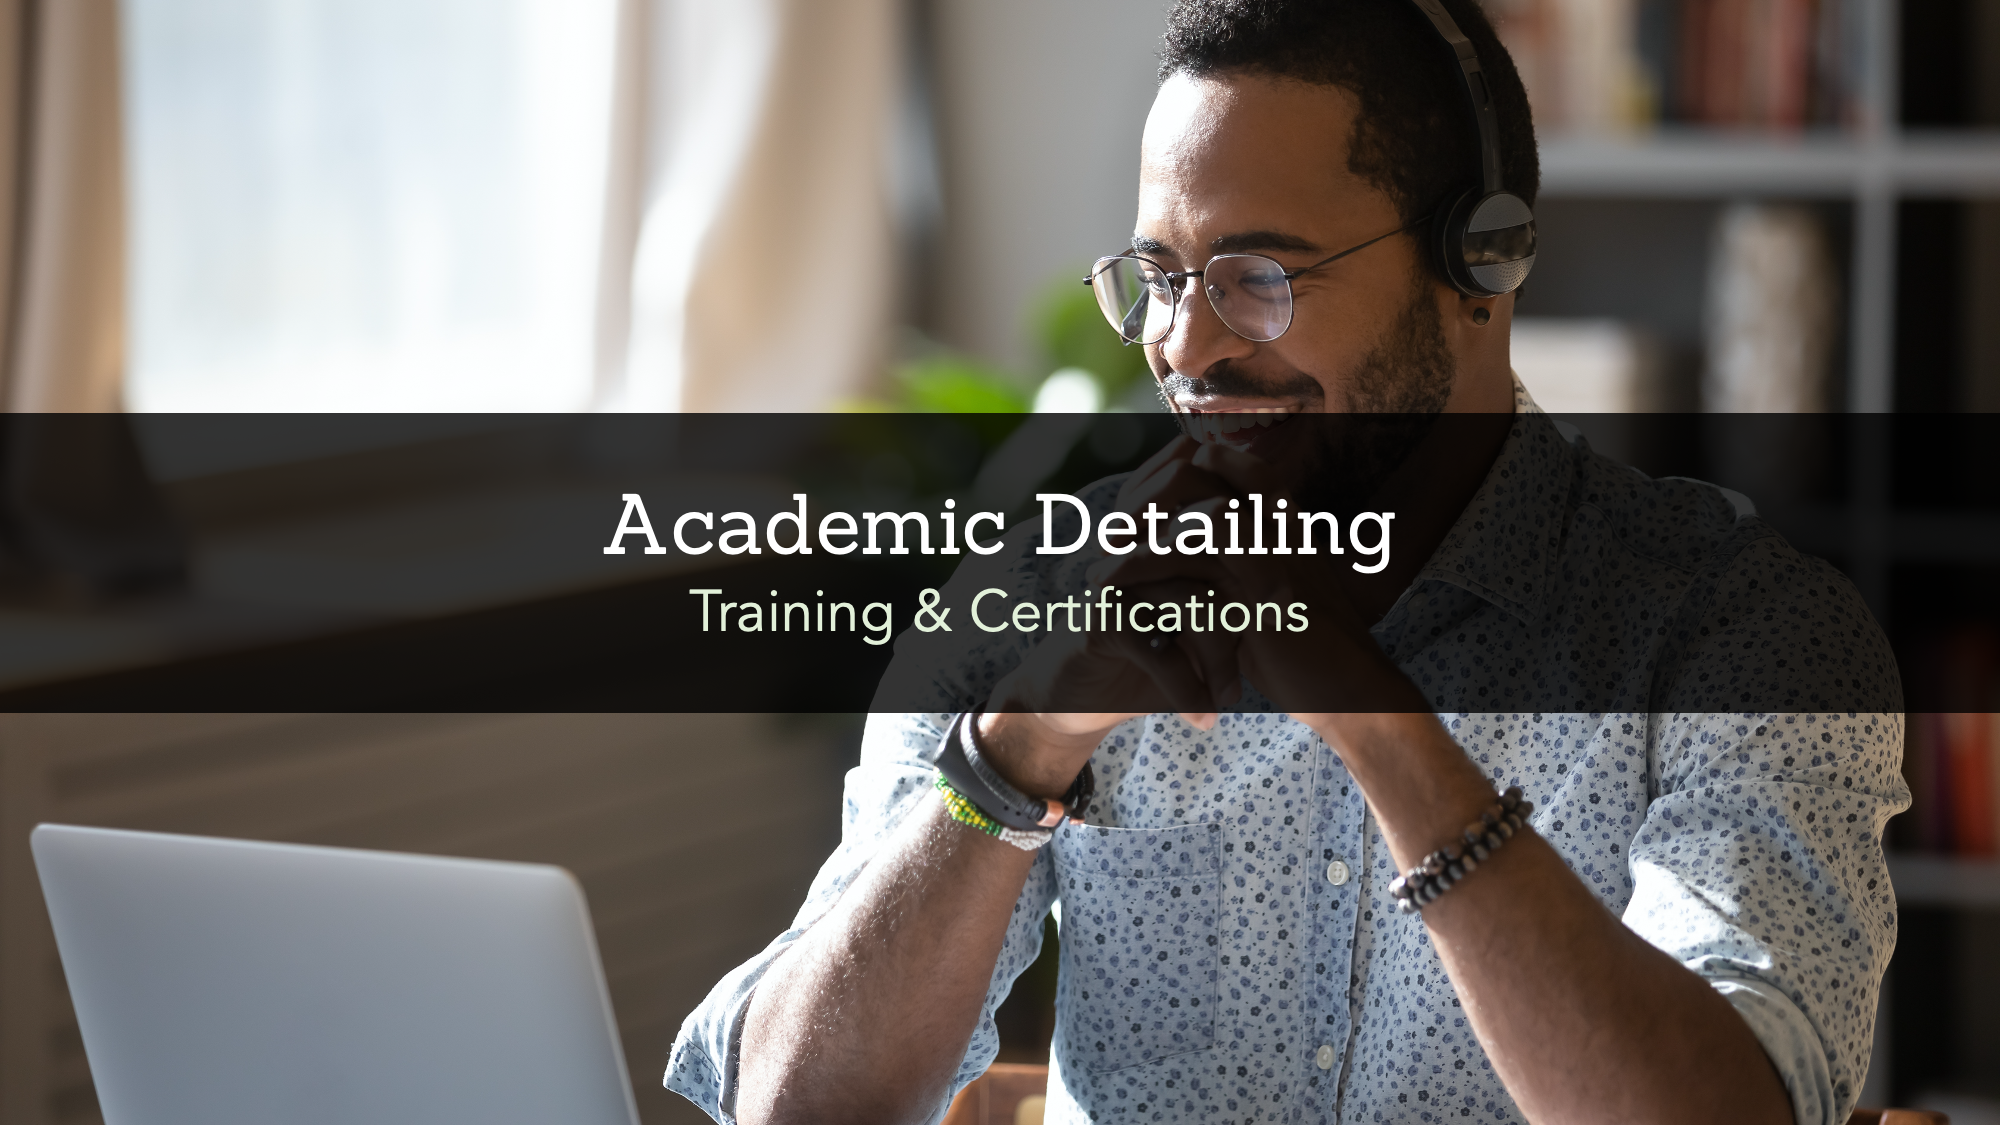 Academic Detailing